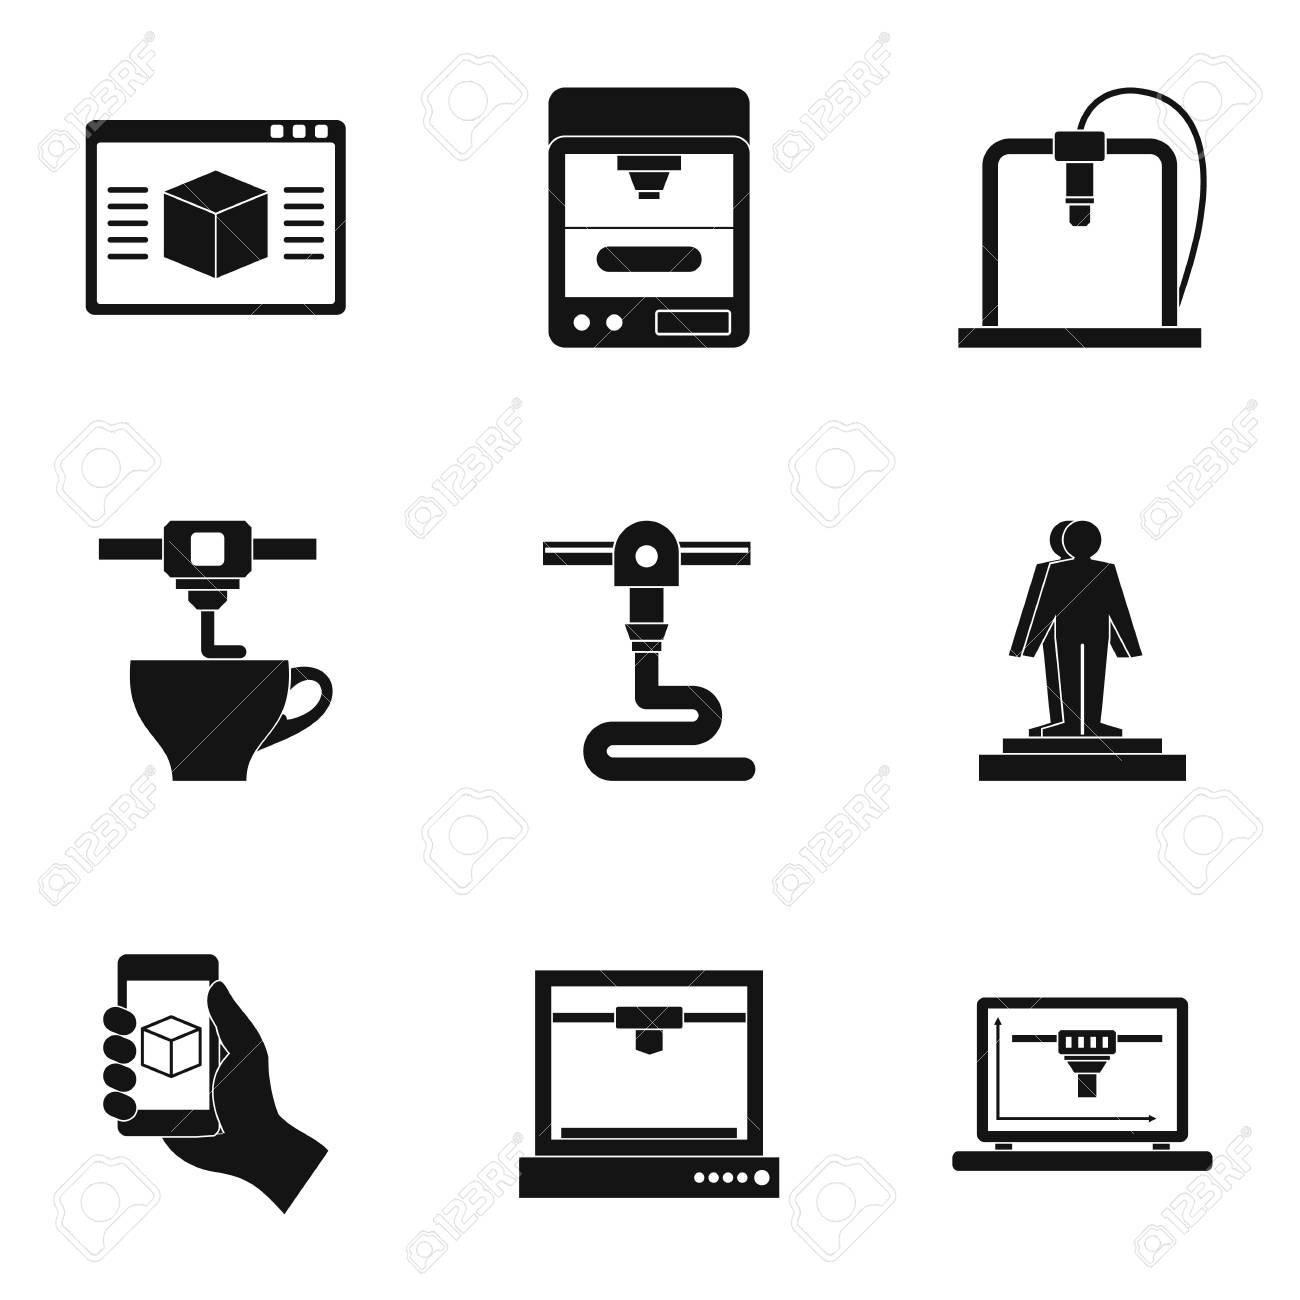 futuristic 3d printer icon set simple set of 9 futuristic 3d royalty free cliparts vectors and stock illustration image 84283226 futuristic 3d printer icon set simple set of 9 futuristic 3d